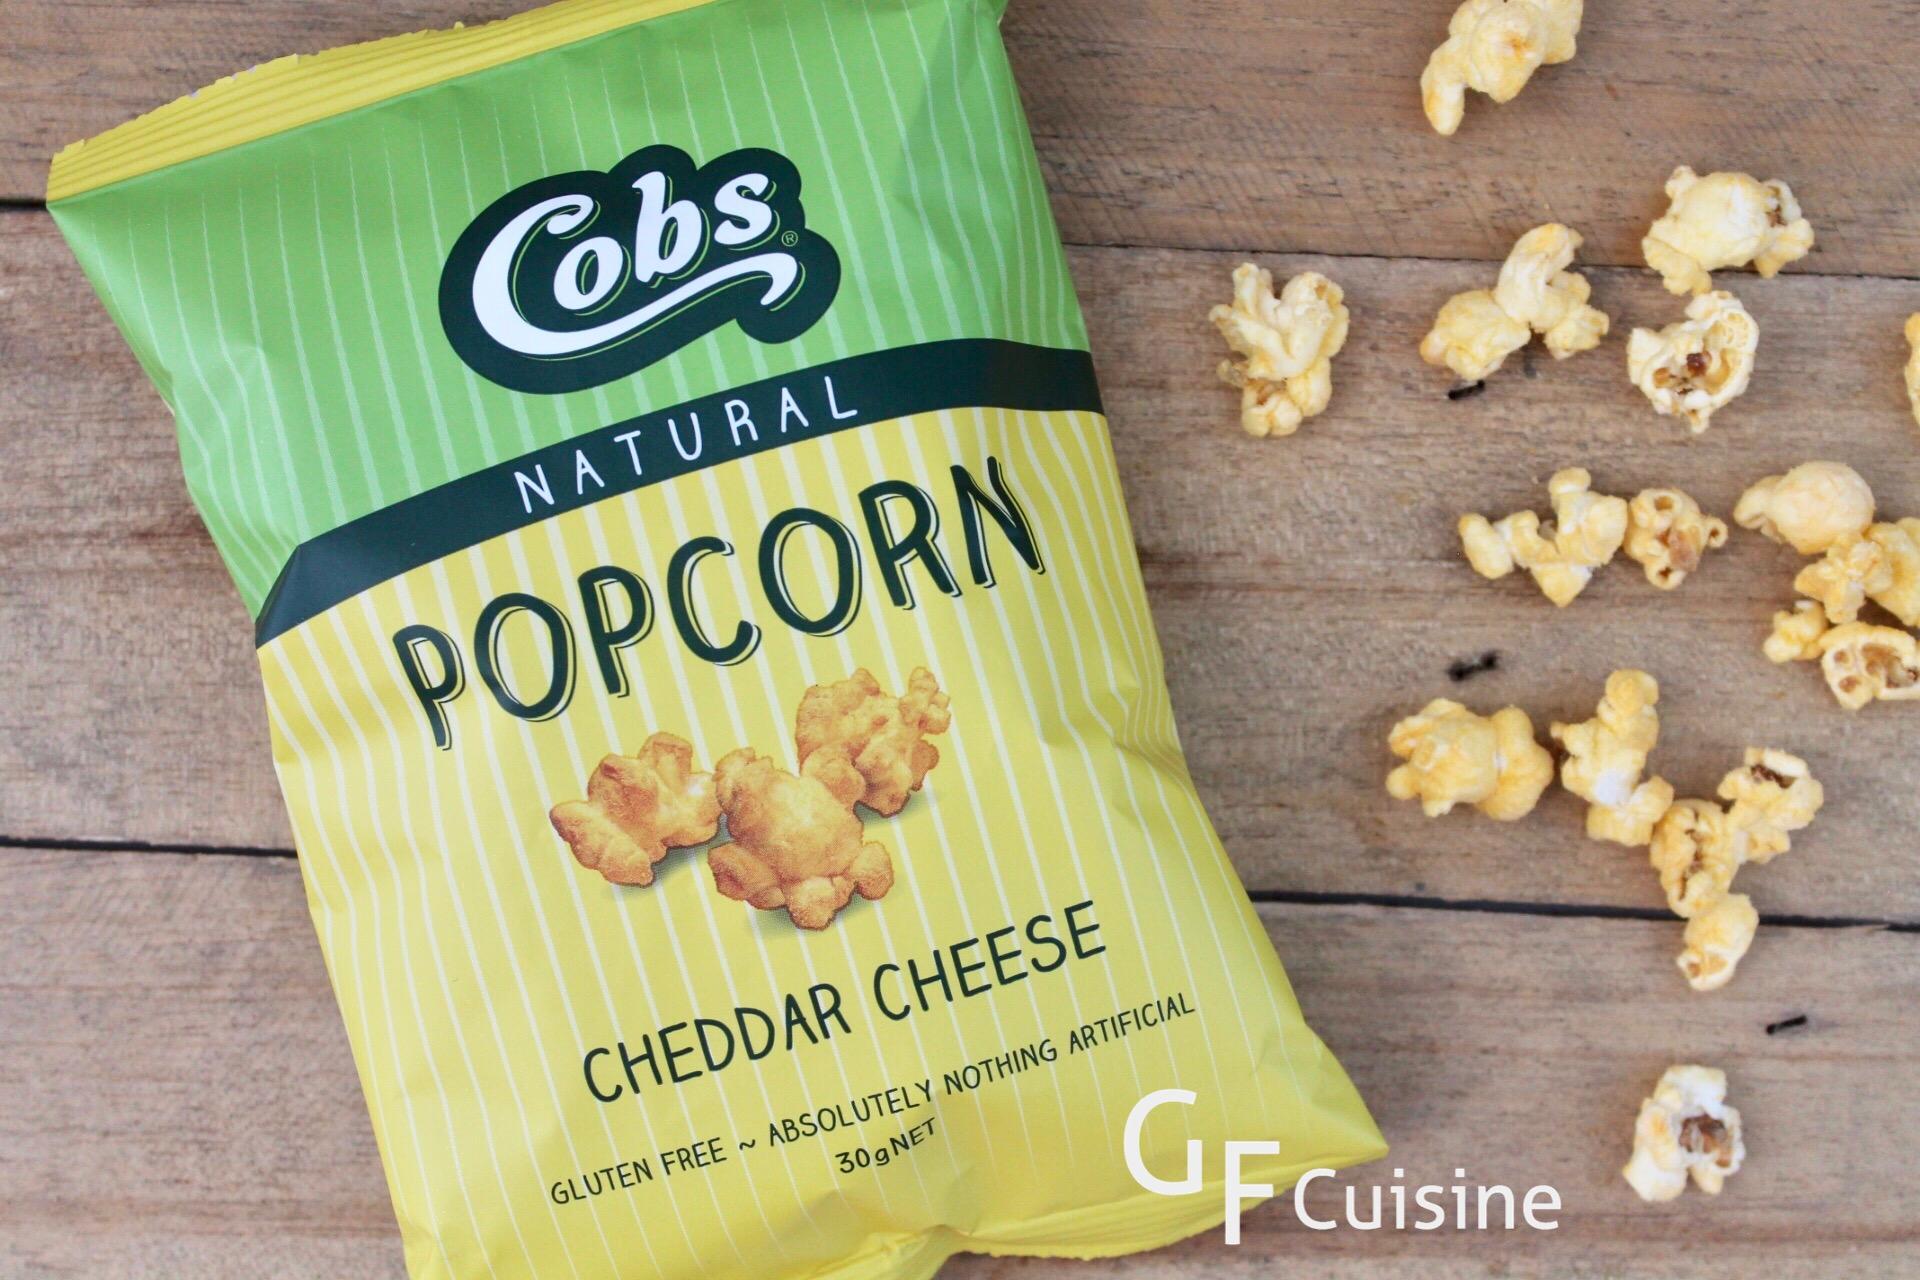 Cobs Popcorn Cheddar Cheese